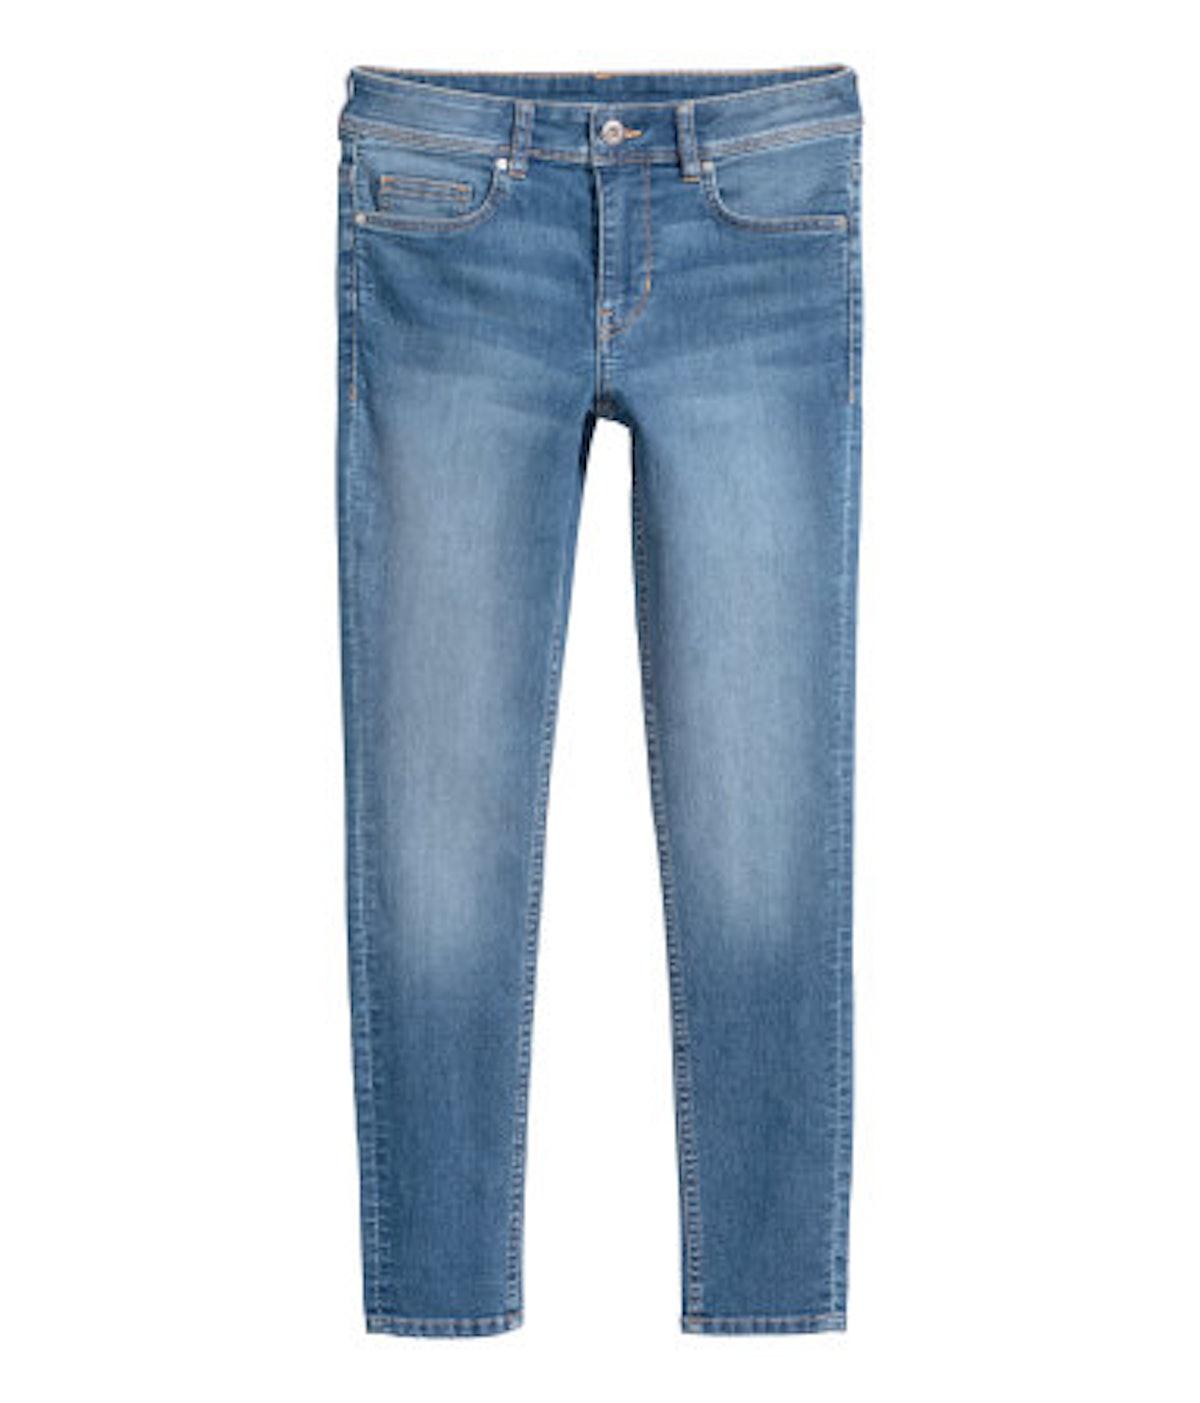 Petit Fit Skinny Jeans